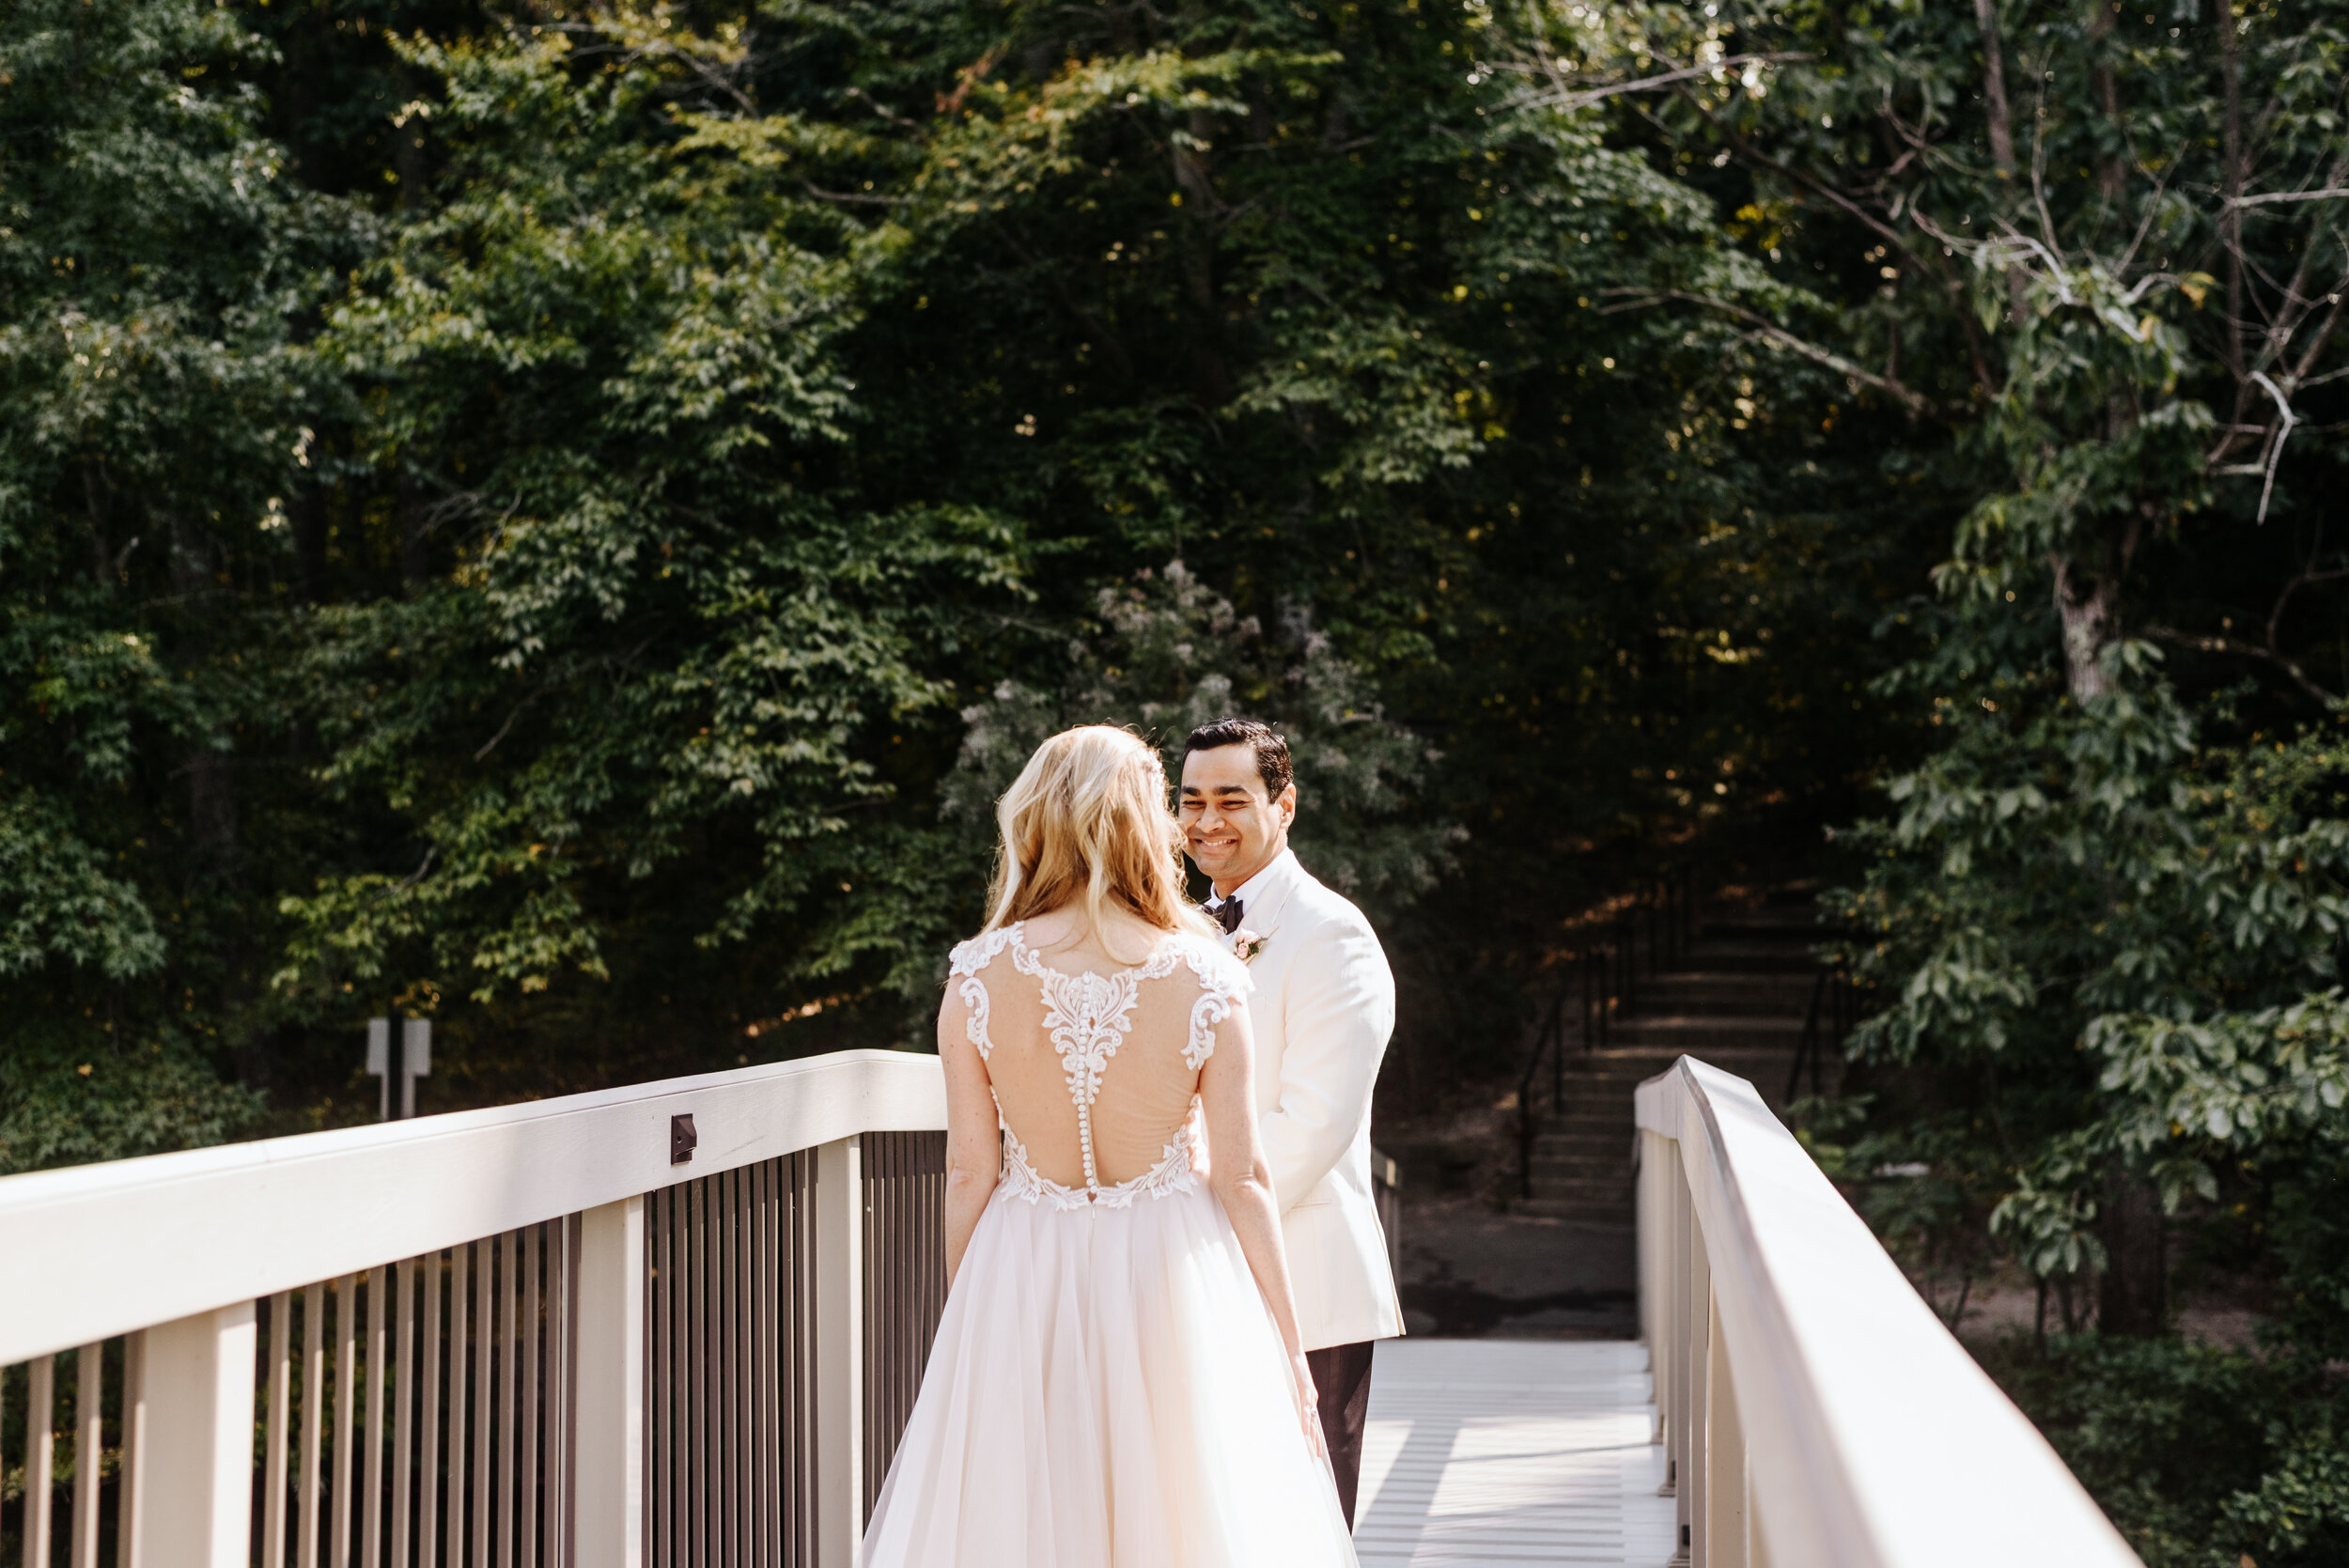 Cassie-Mrunal-Wedding-Quirk-Hotel-John-Marshall-Ballrooms-Richmond-Virginia-Photography-by-V-41.jpg